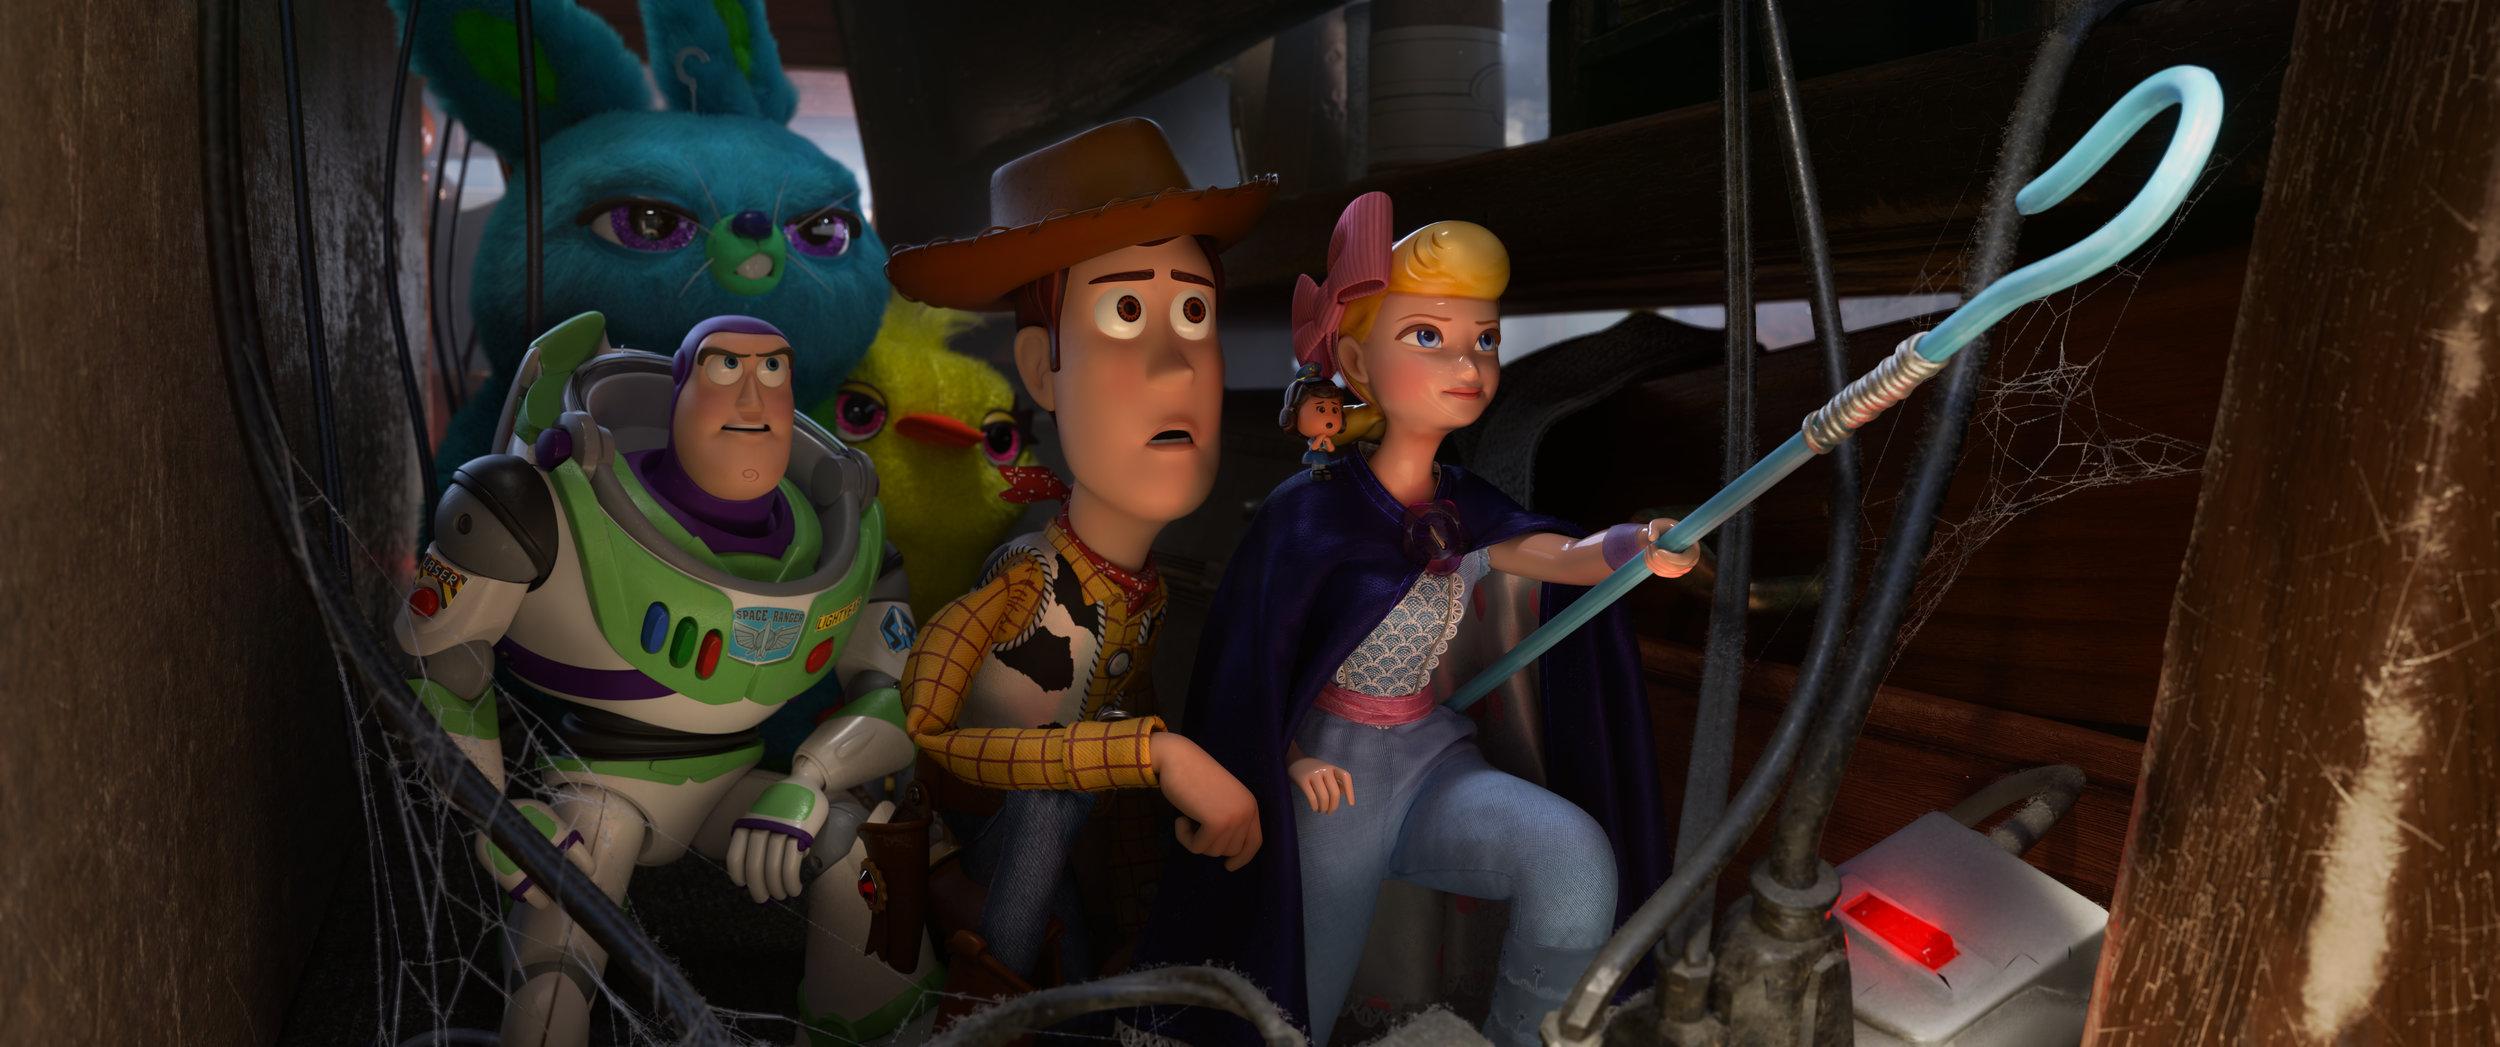 (Image courtesy of Walt Disney and Pixar via Walt Disney Media File)